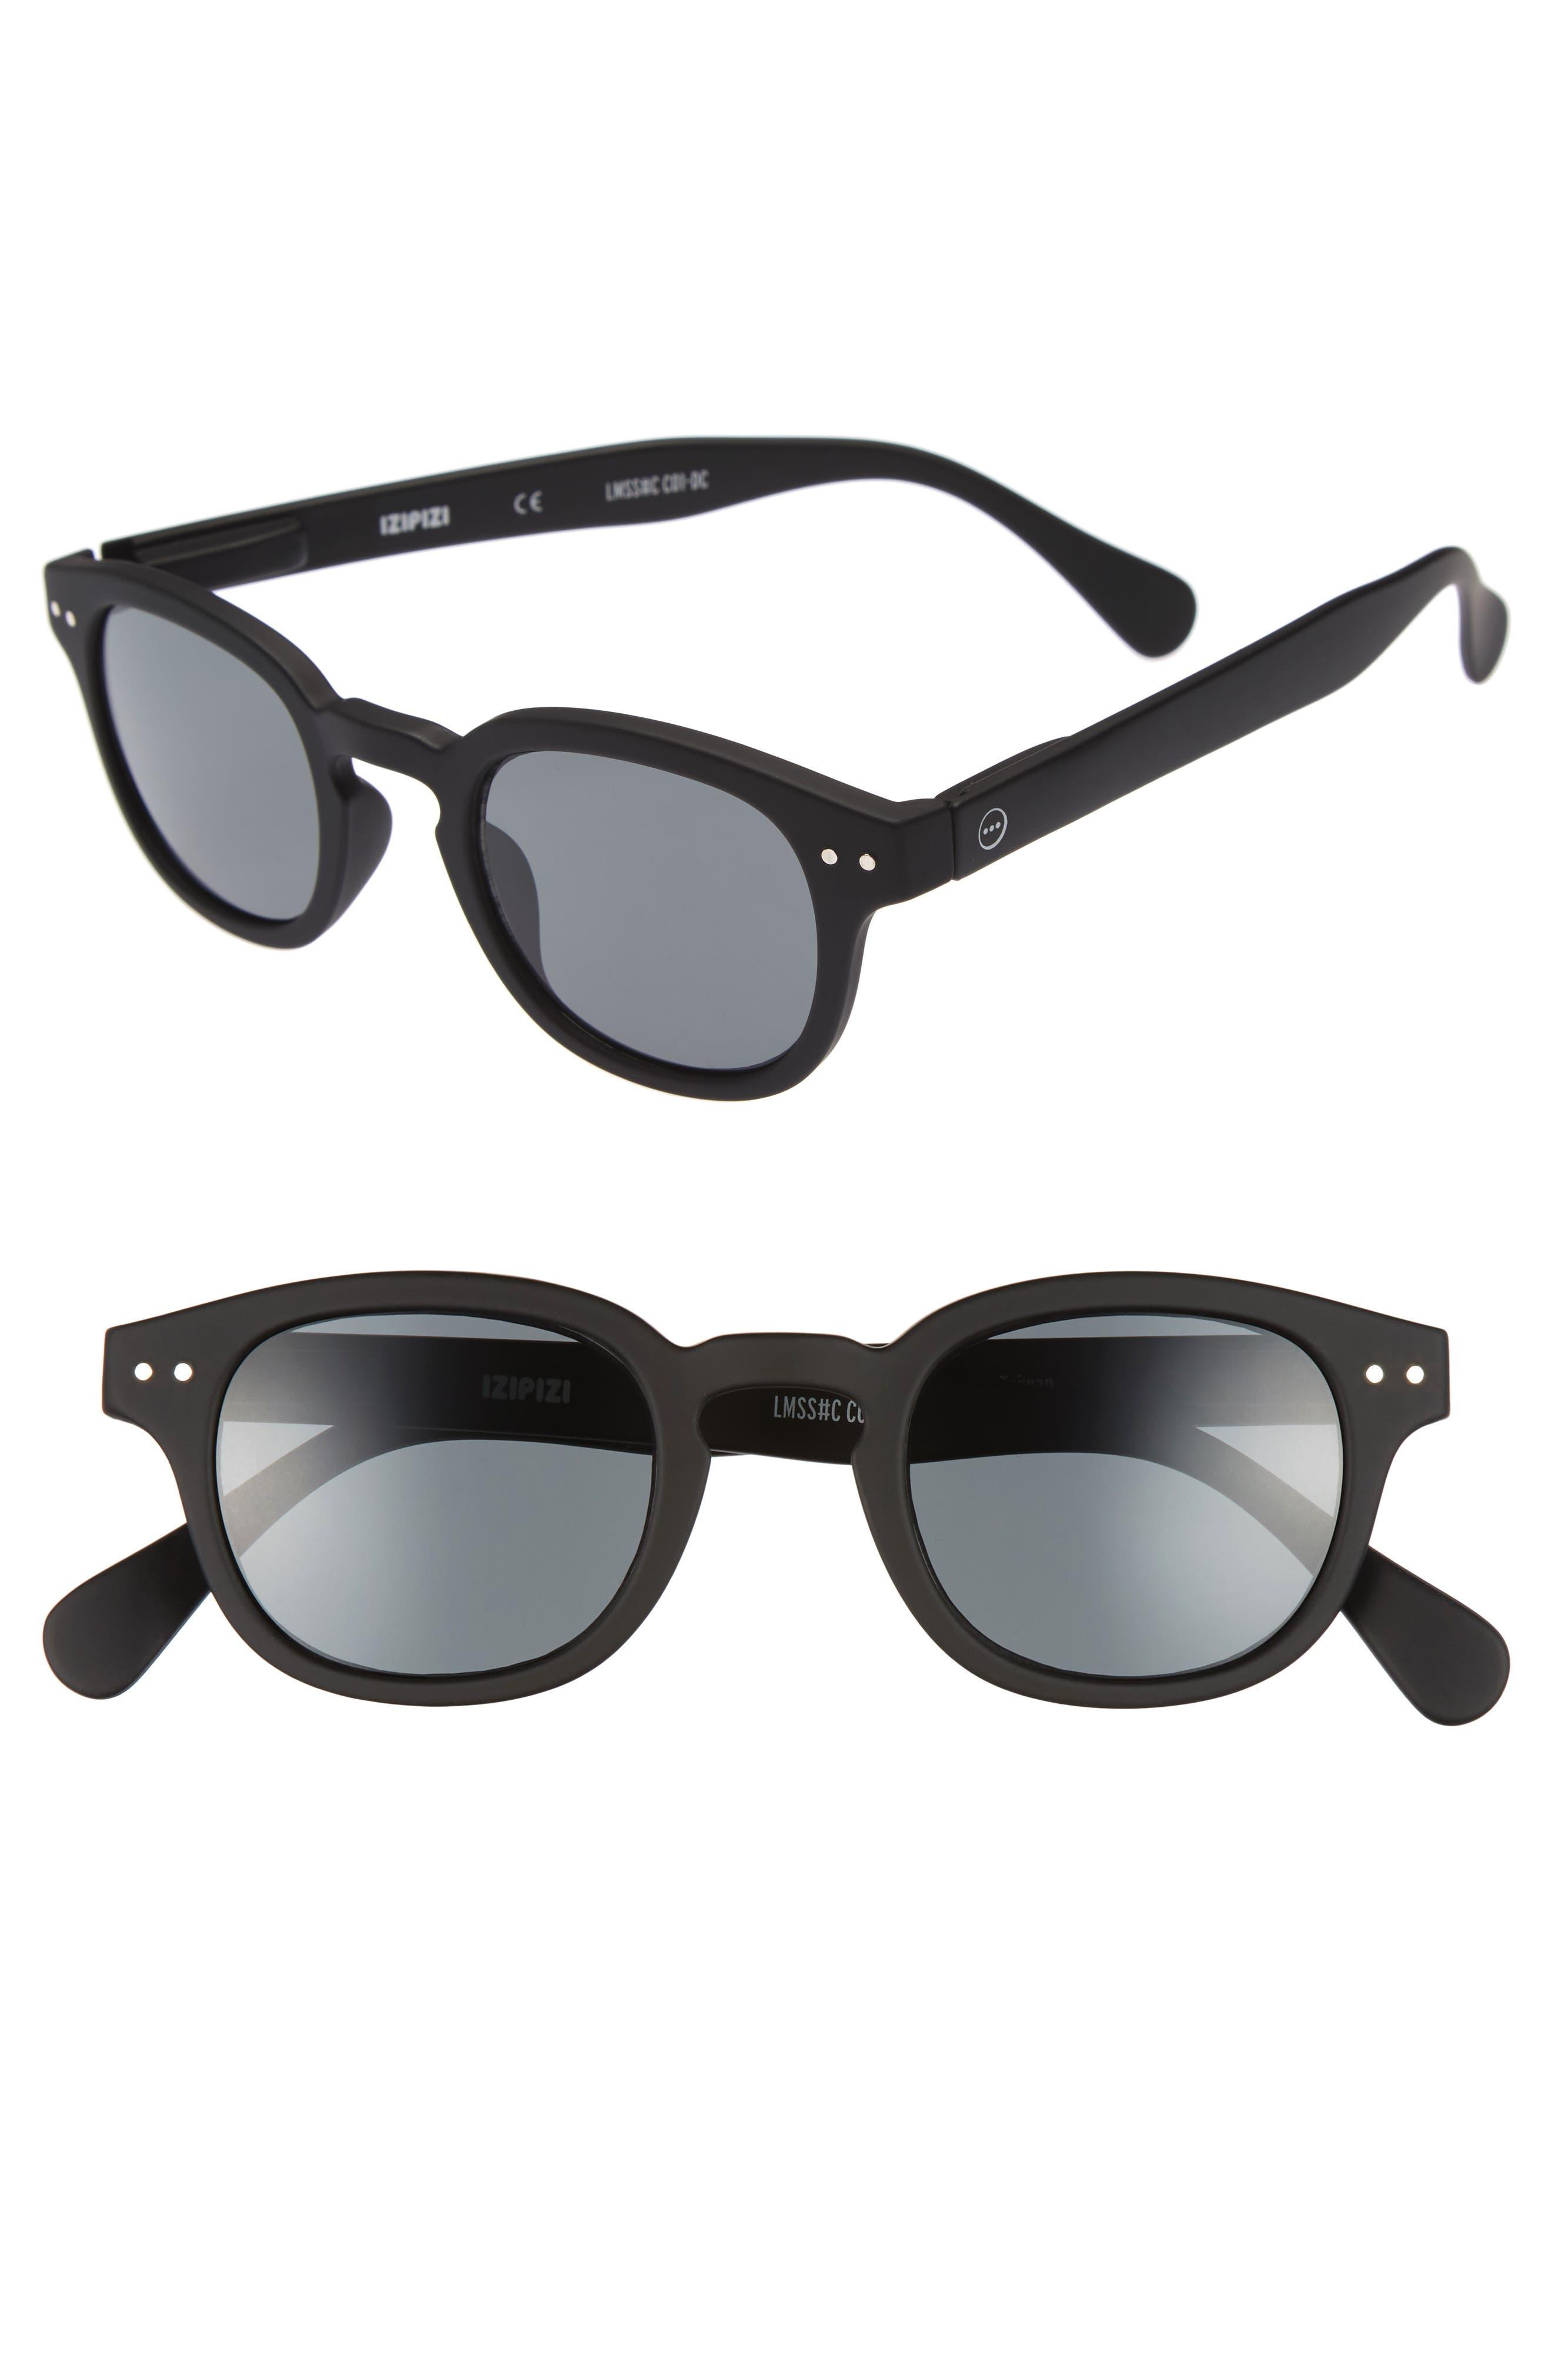 IZIPIZI C 45mm Sunglasses